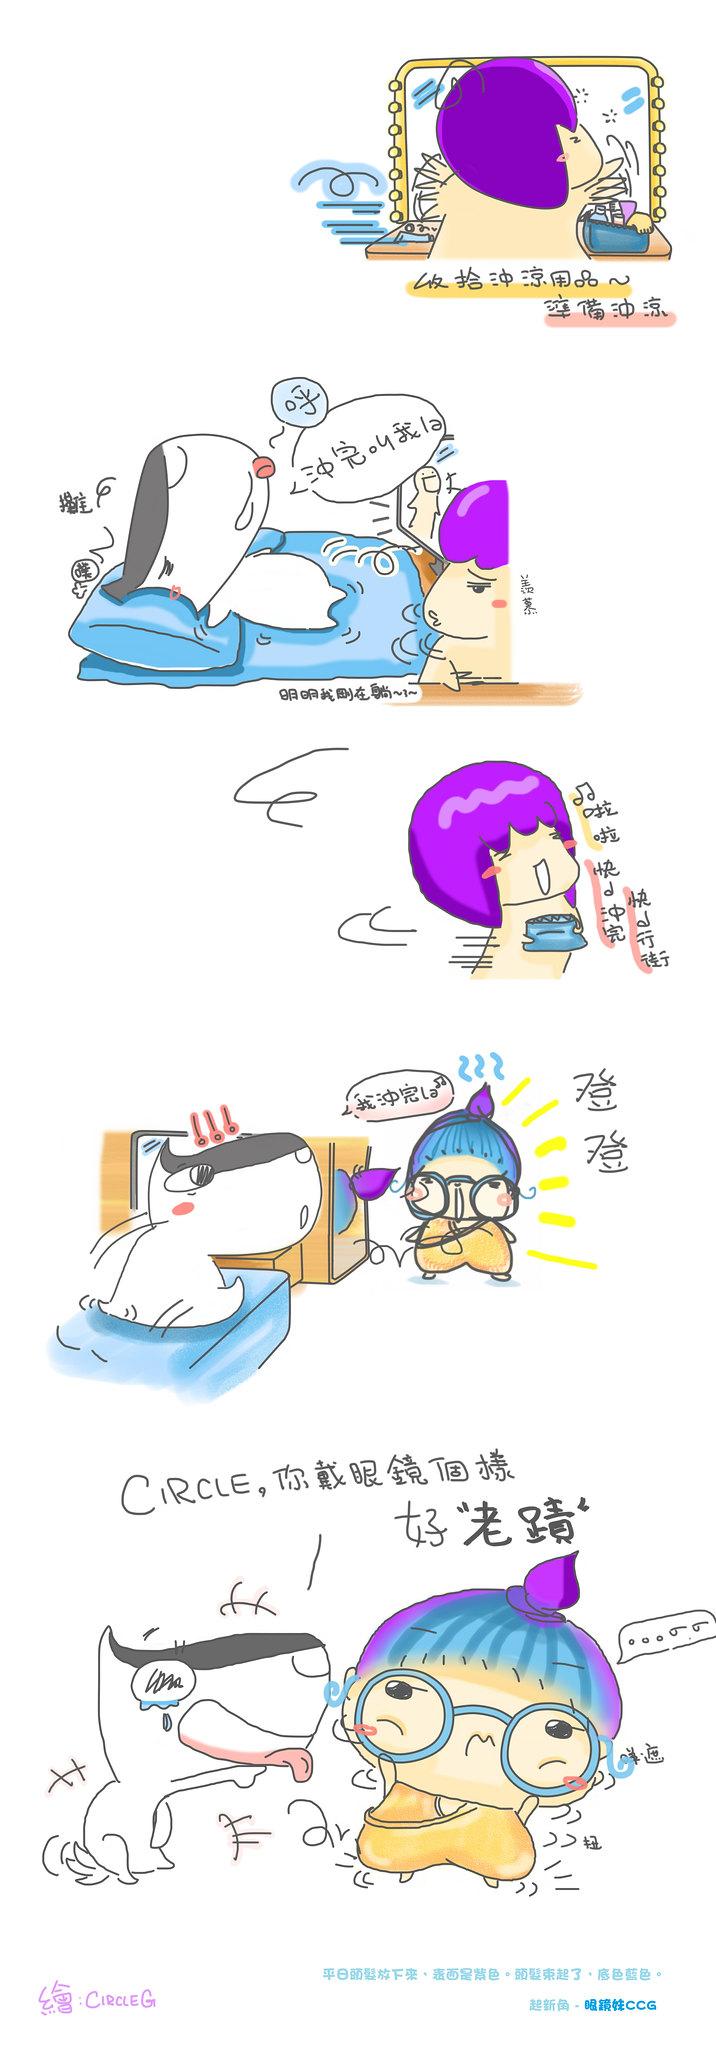 CIRCLEG 腦點系列 小繪圖 哈屎K 眼鏡妹 台灣 台北 夜市 夜景 洗澡 (2)